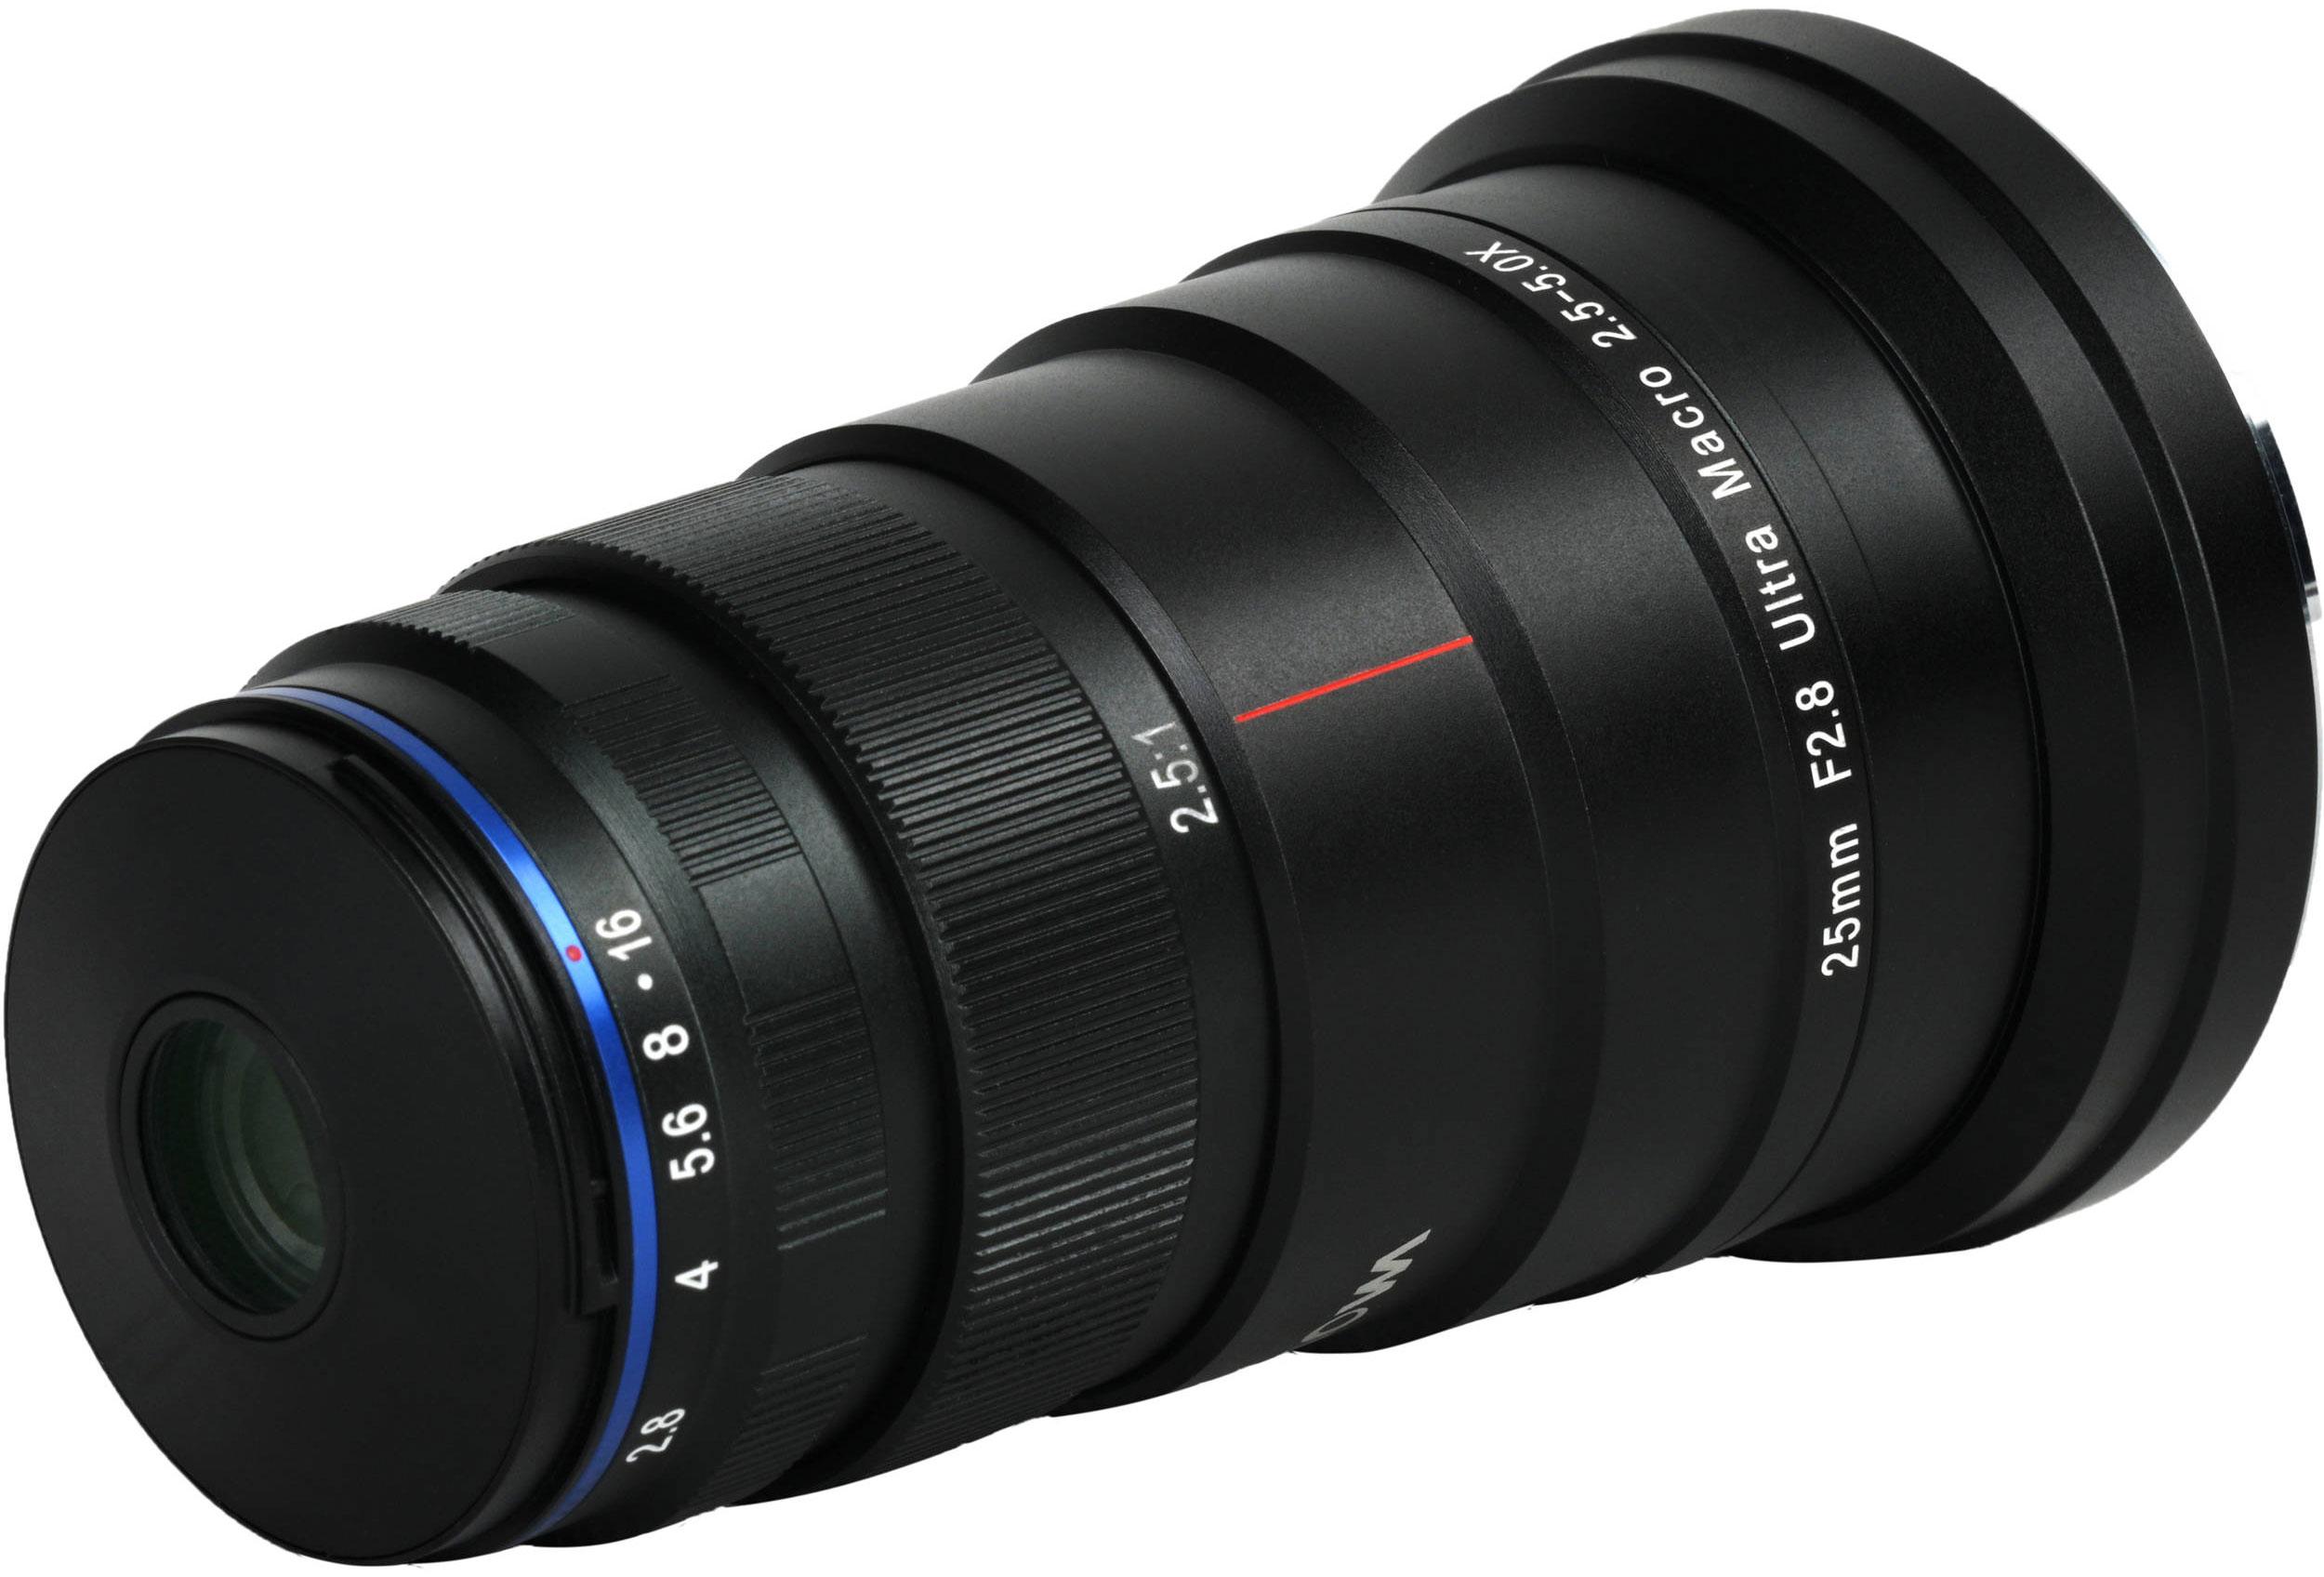 Venus Optics Laowa 25mm f/2.8 2.5-5X Ultra Macro Lens